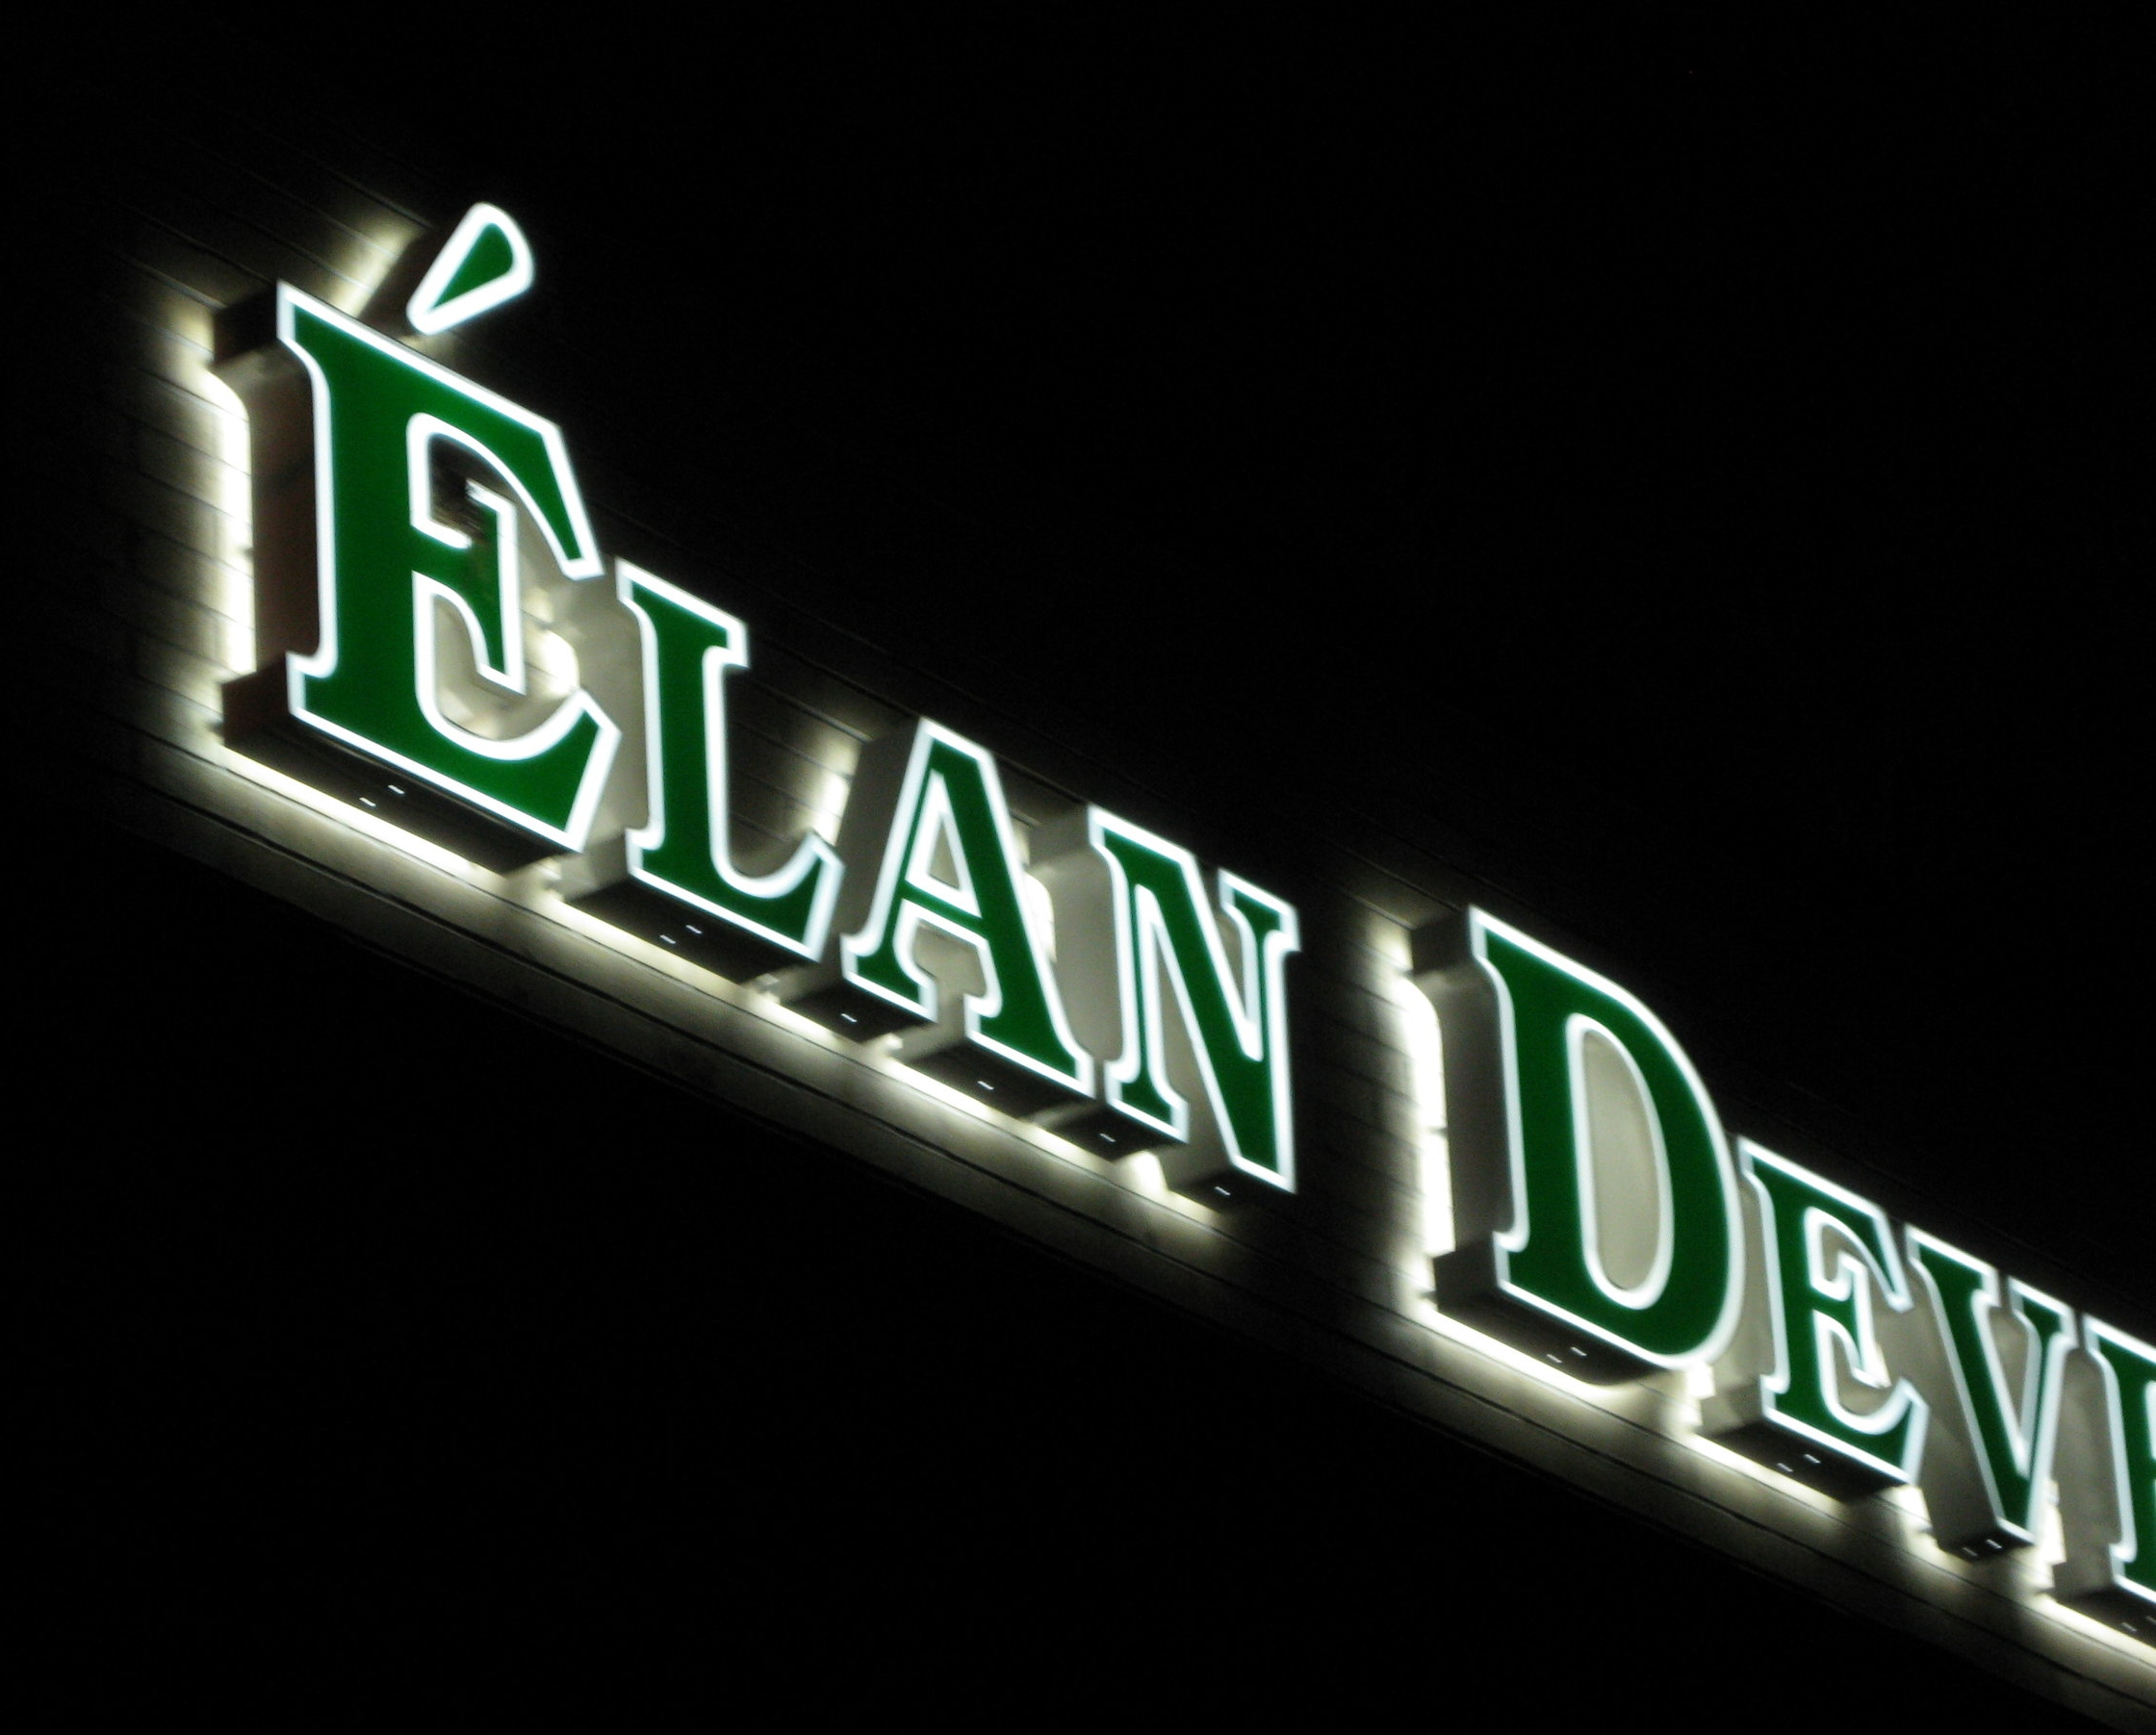 Elan Developement - Front and back channel letter sign